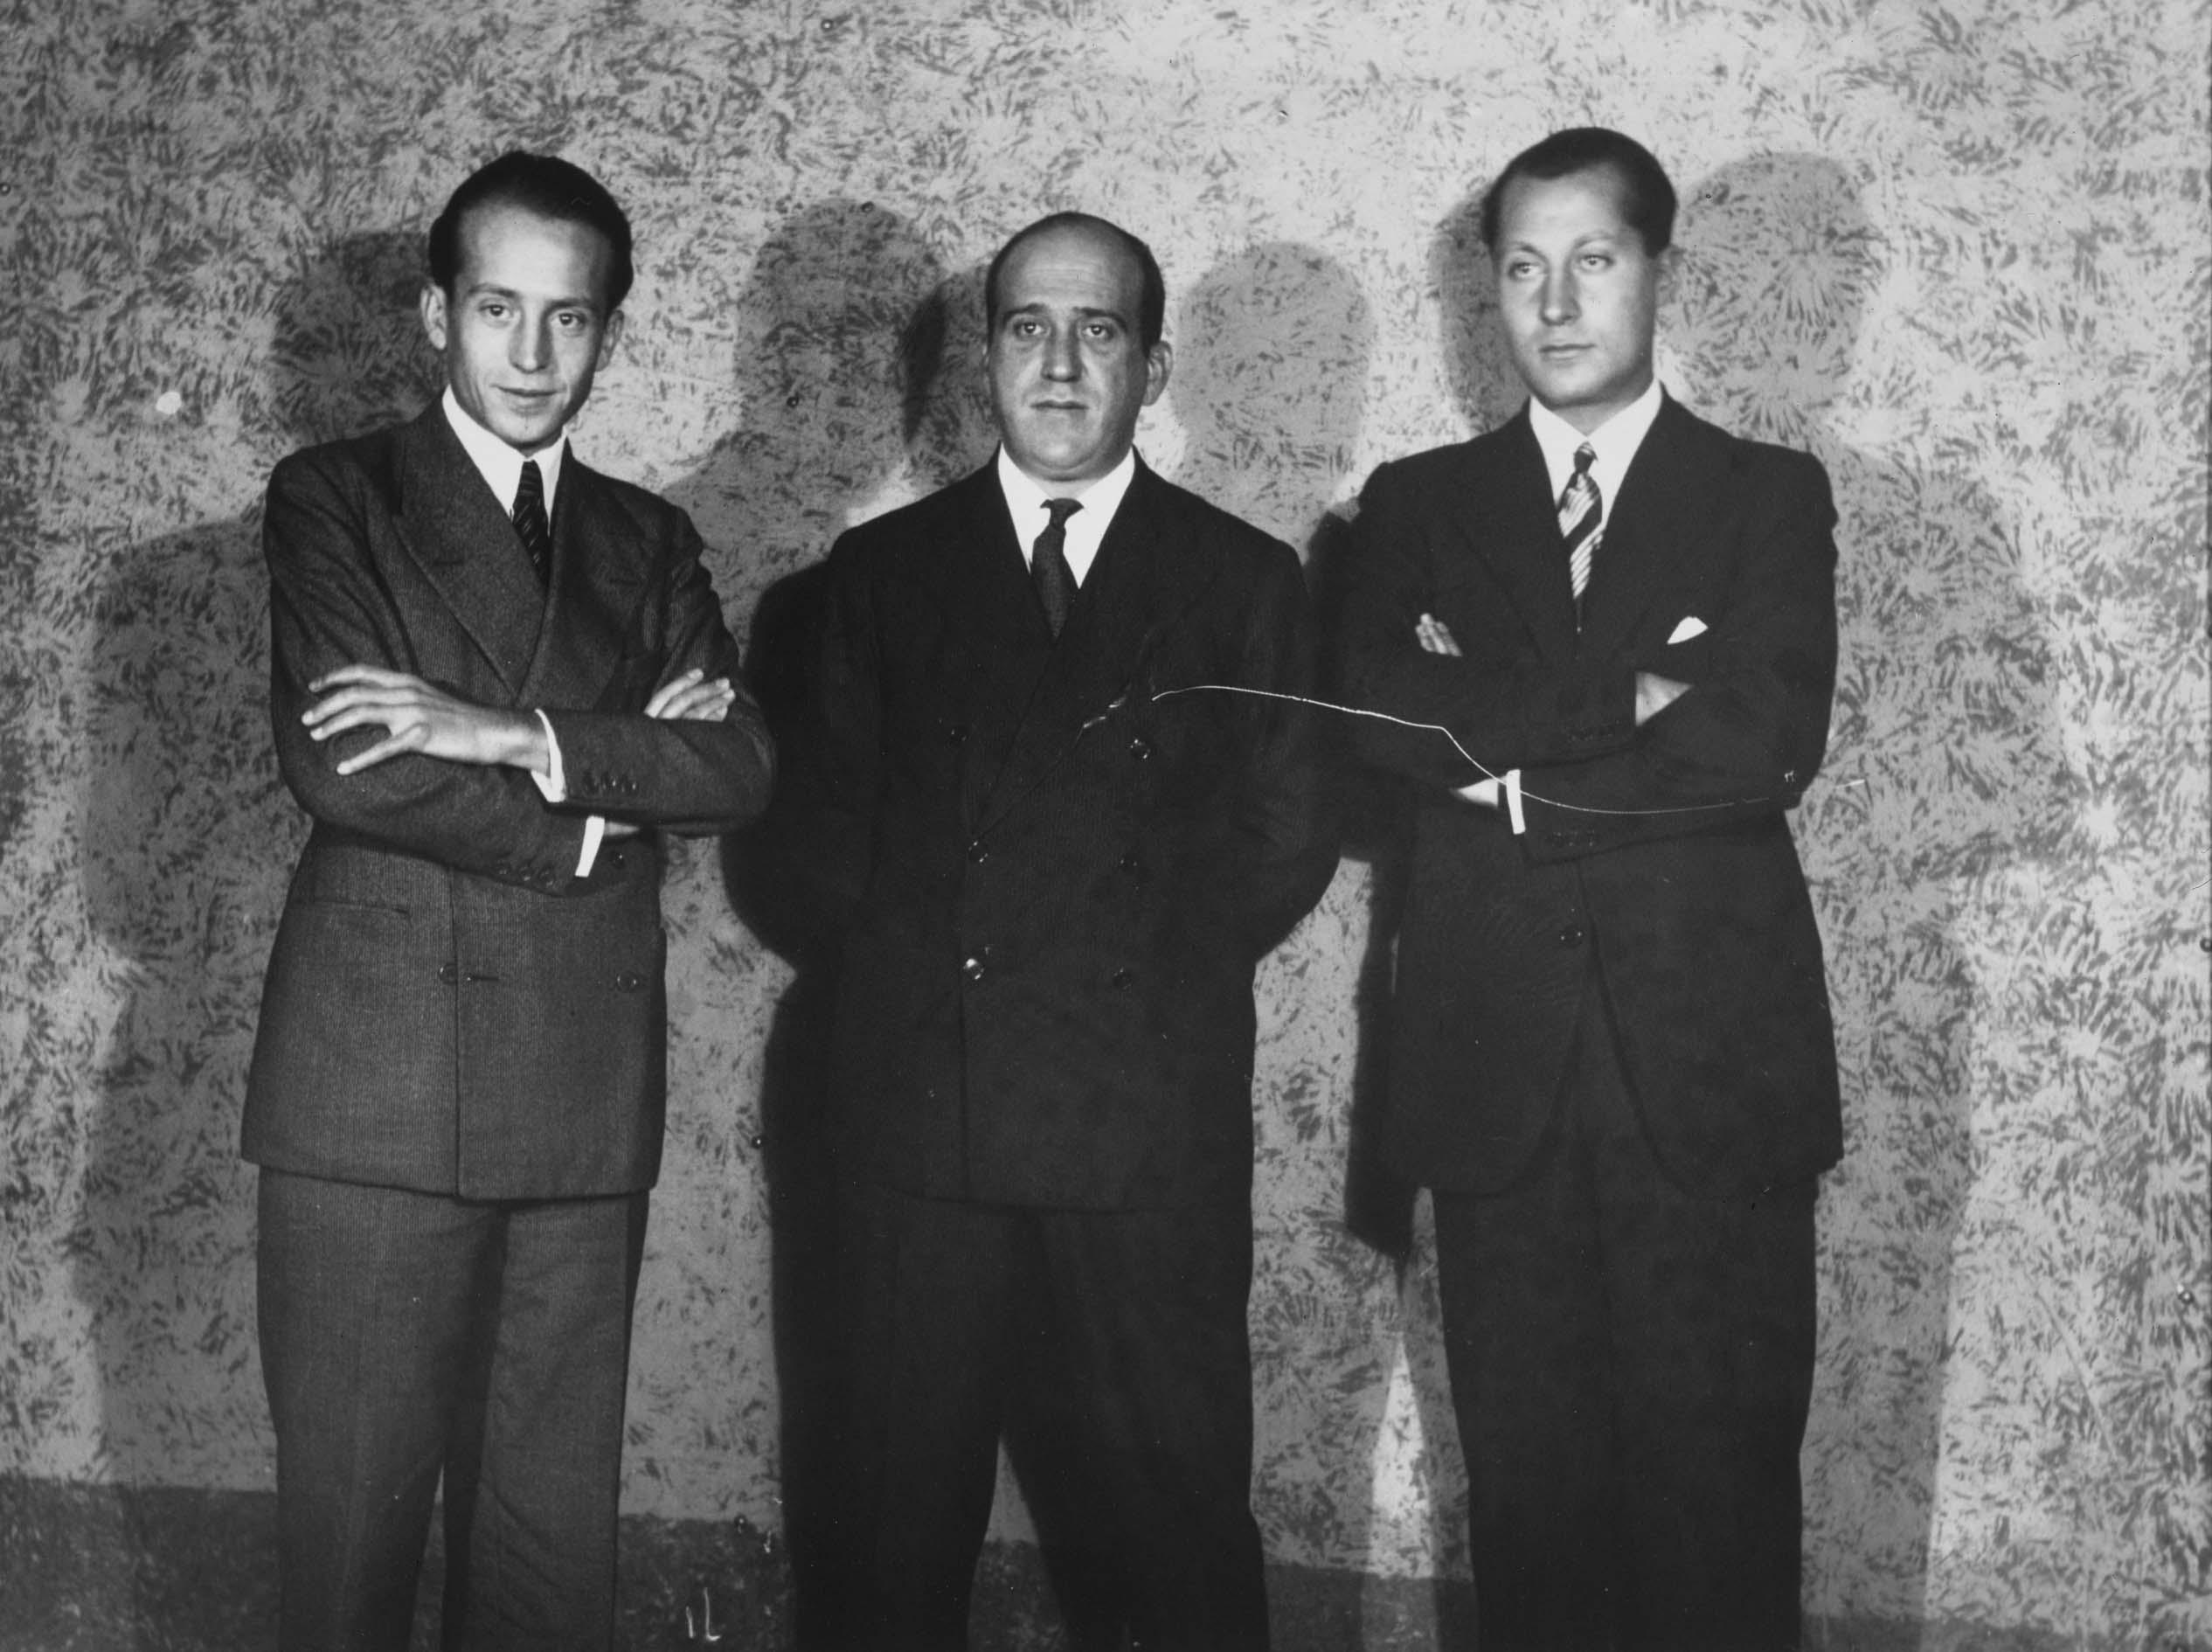 From left to right, Alfonso García Valdecasas, Julio Ruiz de Alda and José Antonio Primo de Rivera, at the Teatro de la Comedia in Madrid, during the founding act of the Spanish Falangist party. Photo: Alfonso Sánchez Portela. Reina Sofía National Art Museum.